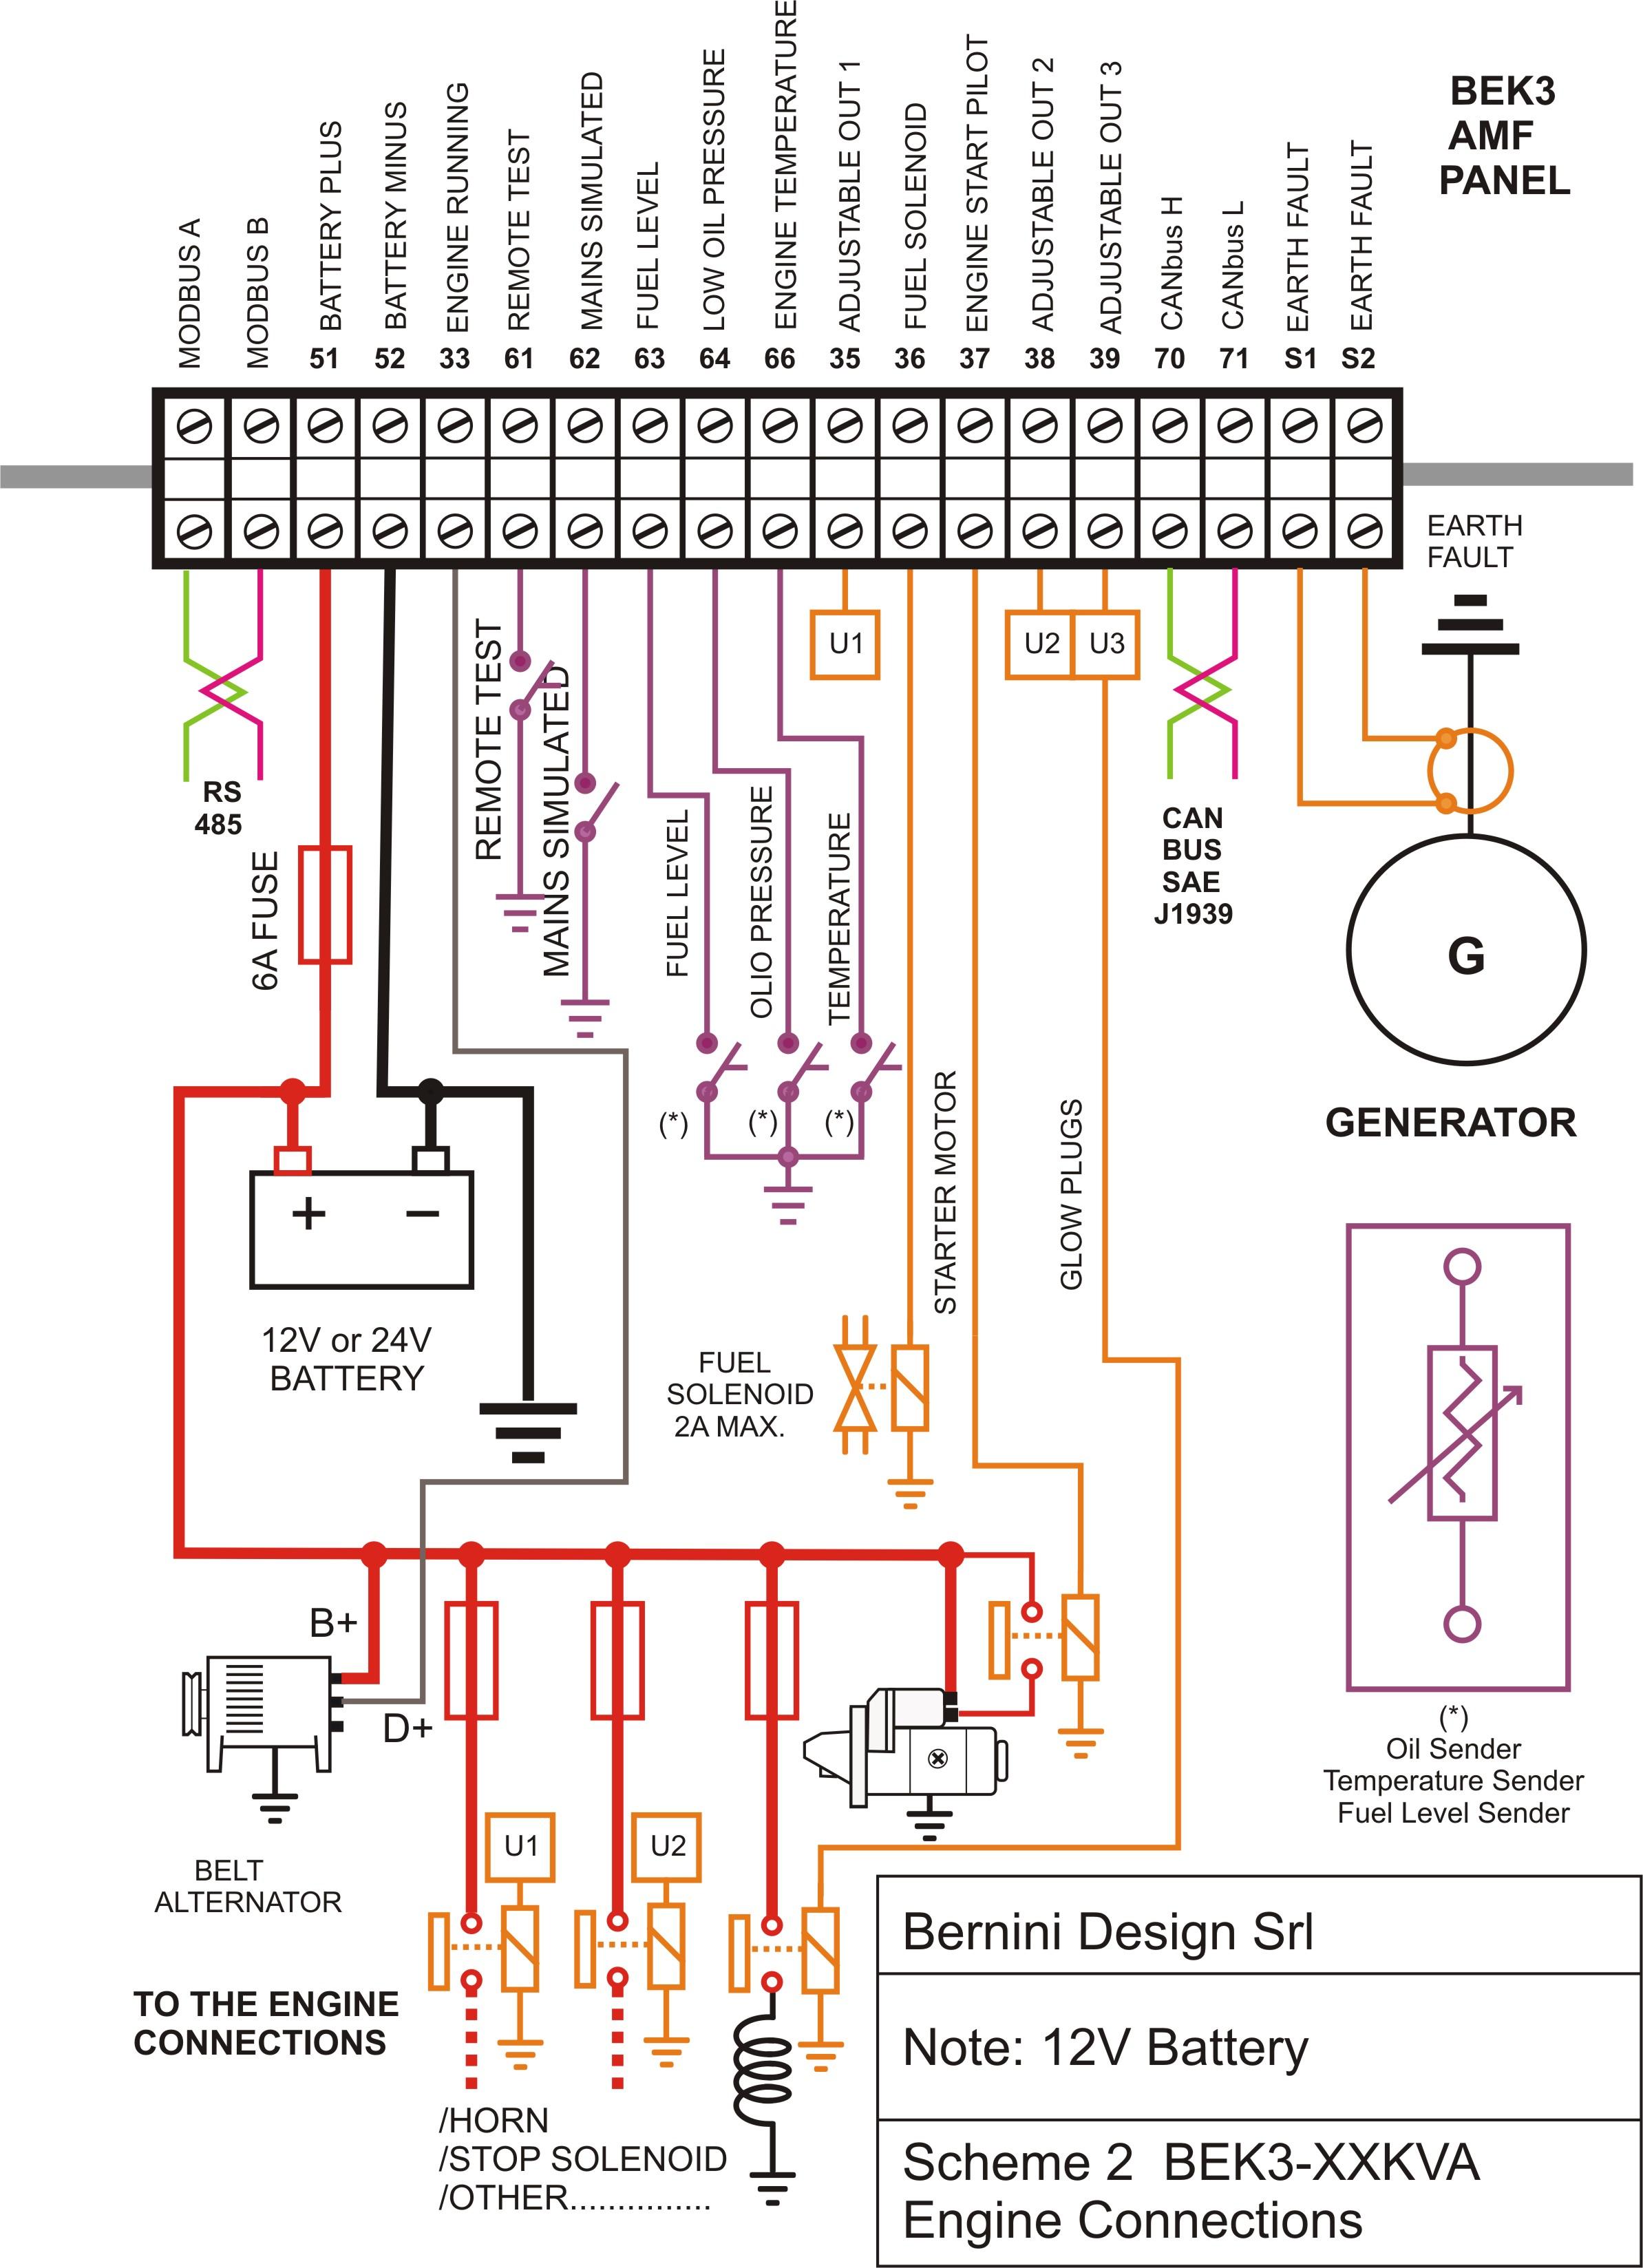 Kohler 5e Wiring Diagram – Kohler Marine Generator Wiring Diagram